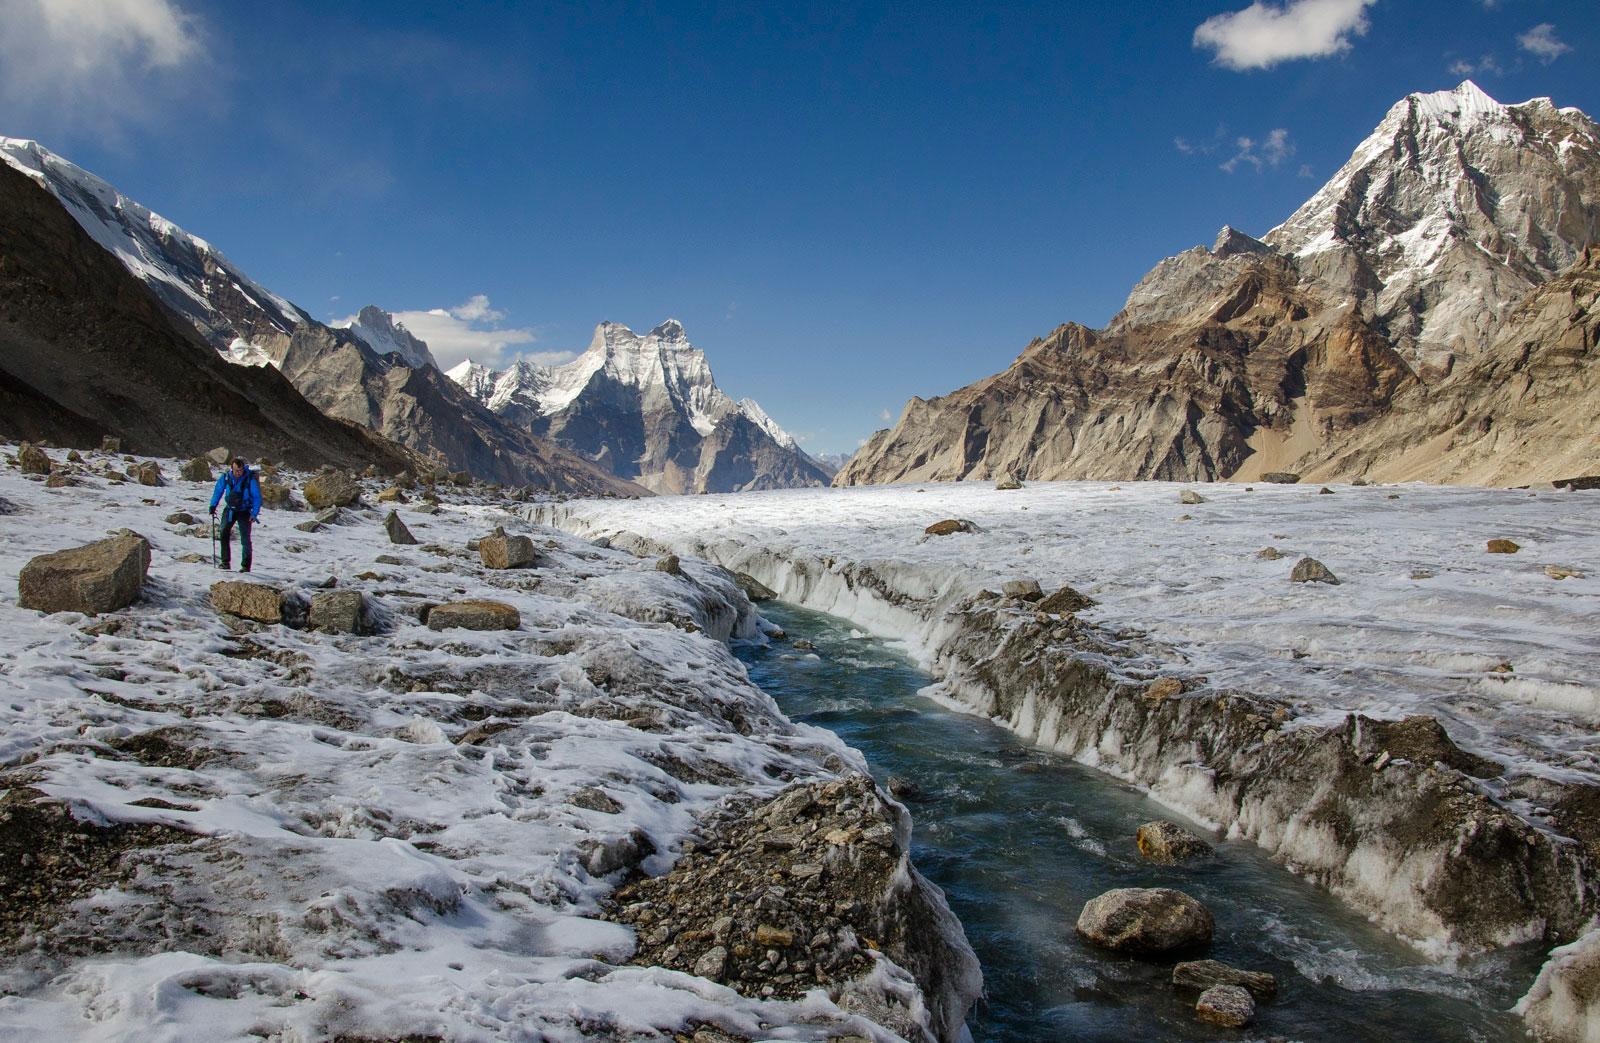 Dave Morton at 17000 ft near top of Gangotri glacier below Chaukhamba iv - near virtual source of Ganges.